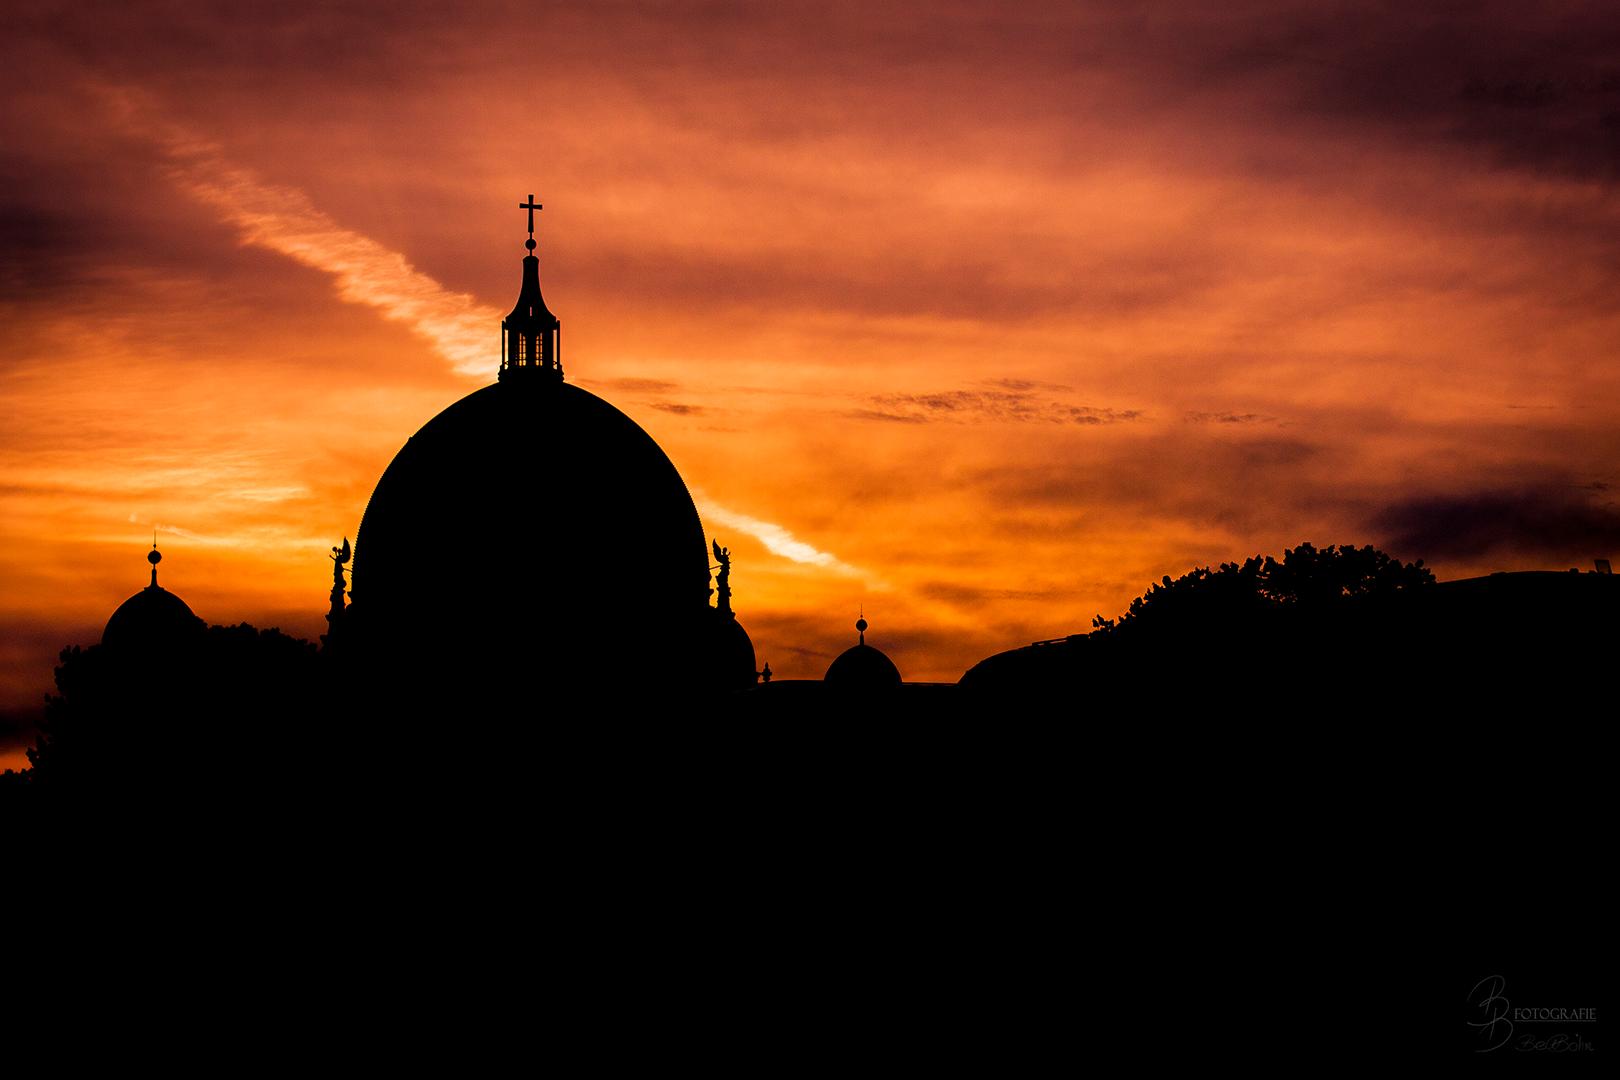 05 Sonnenuntergang über dem Berliner Dom